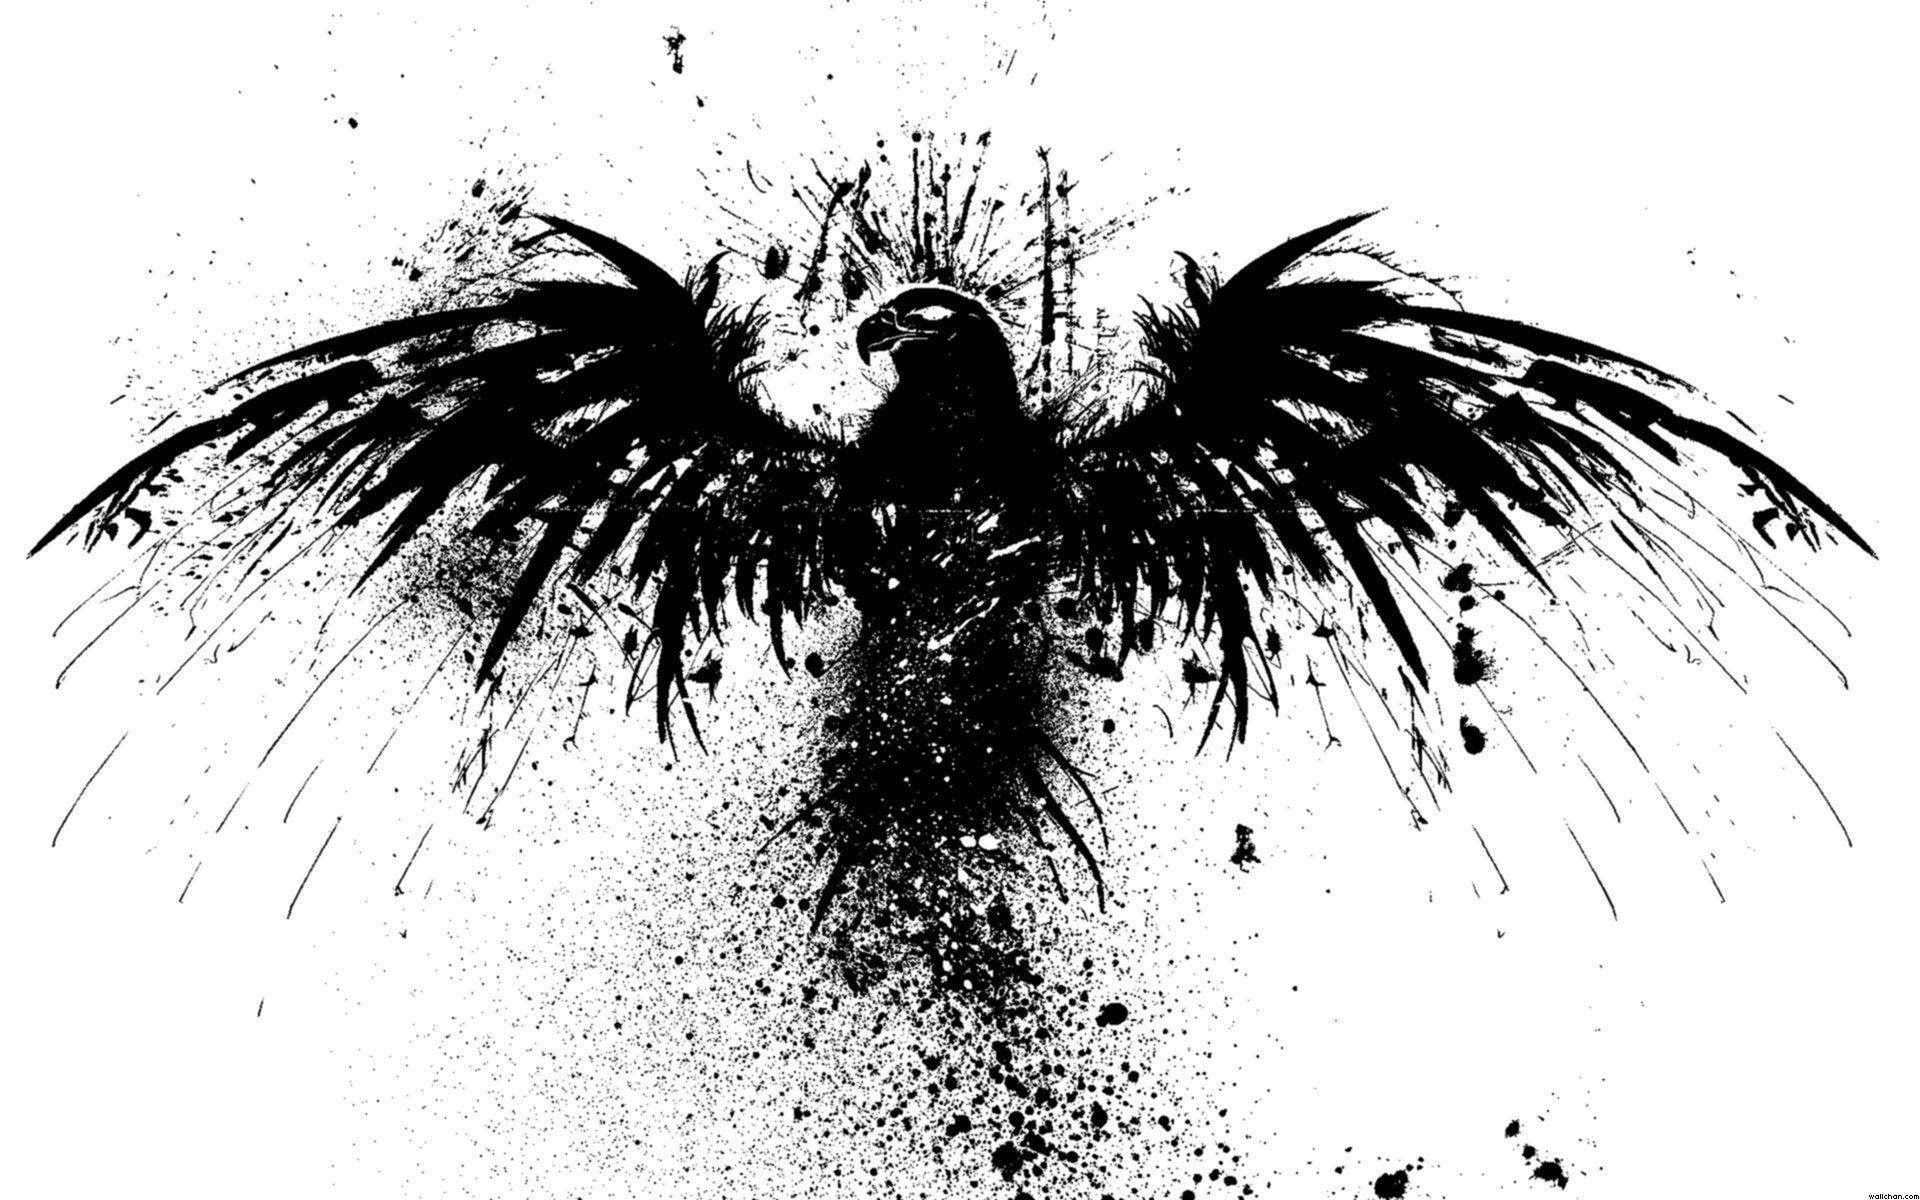 Super Black Eagle 3 | Benelli Shotguns and Rifles